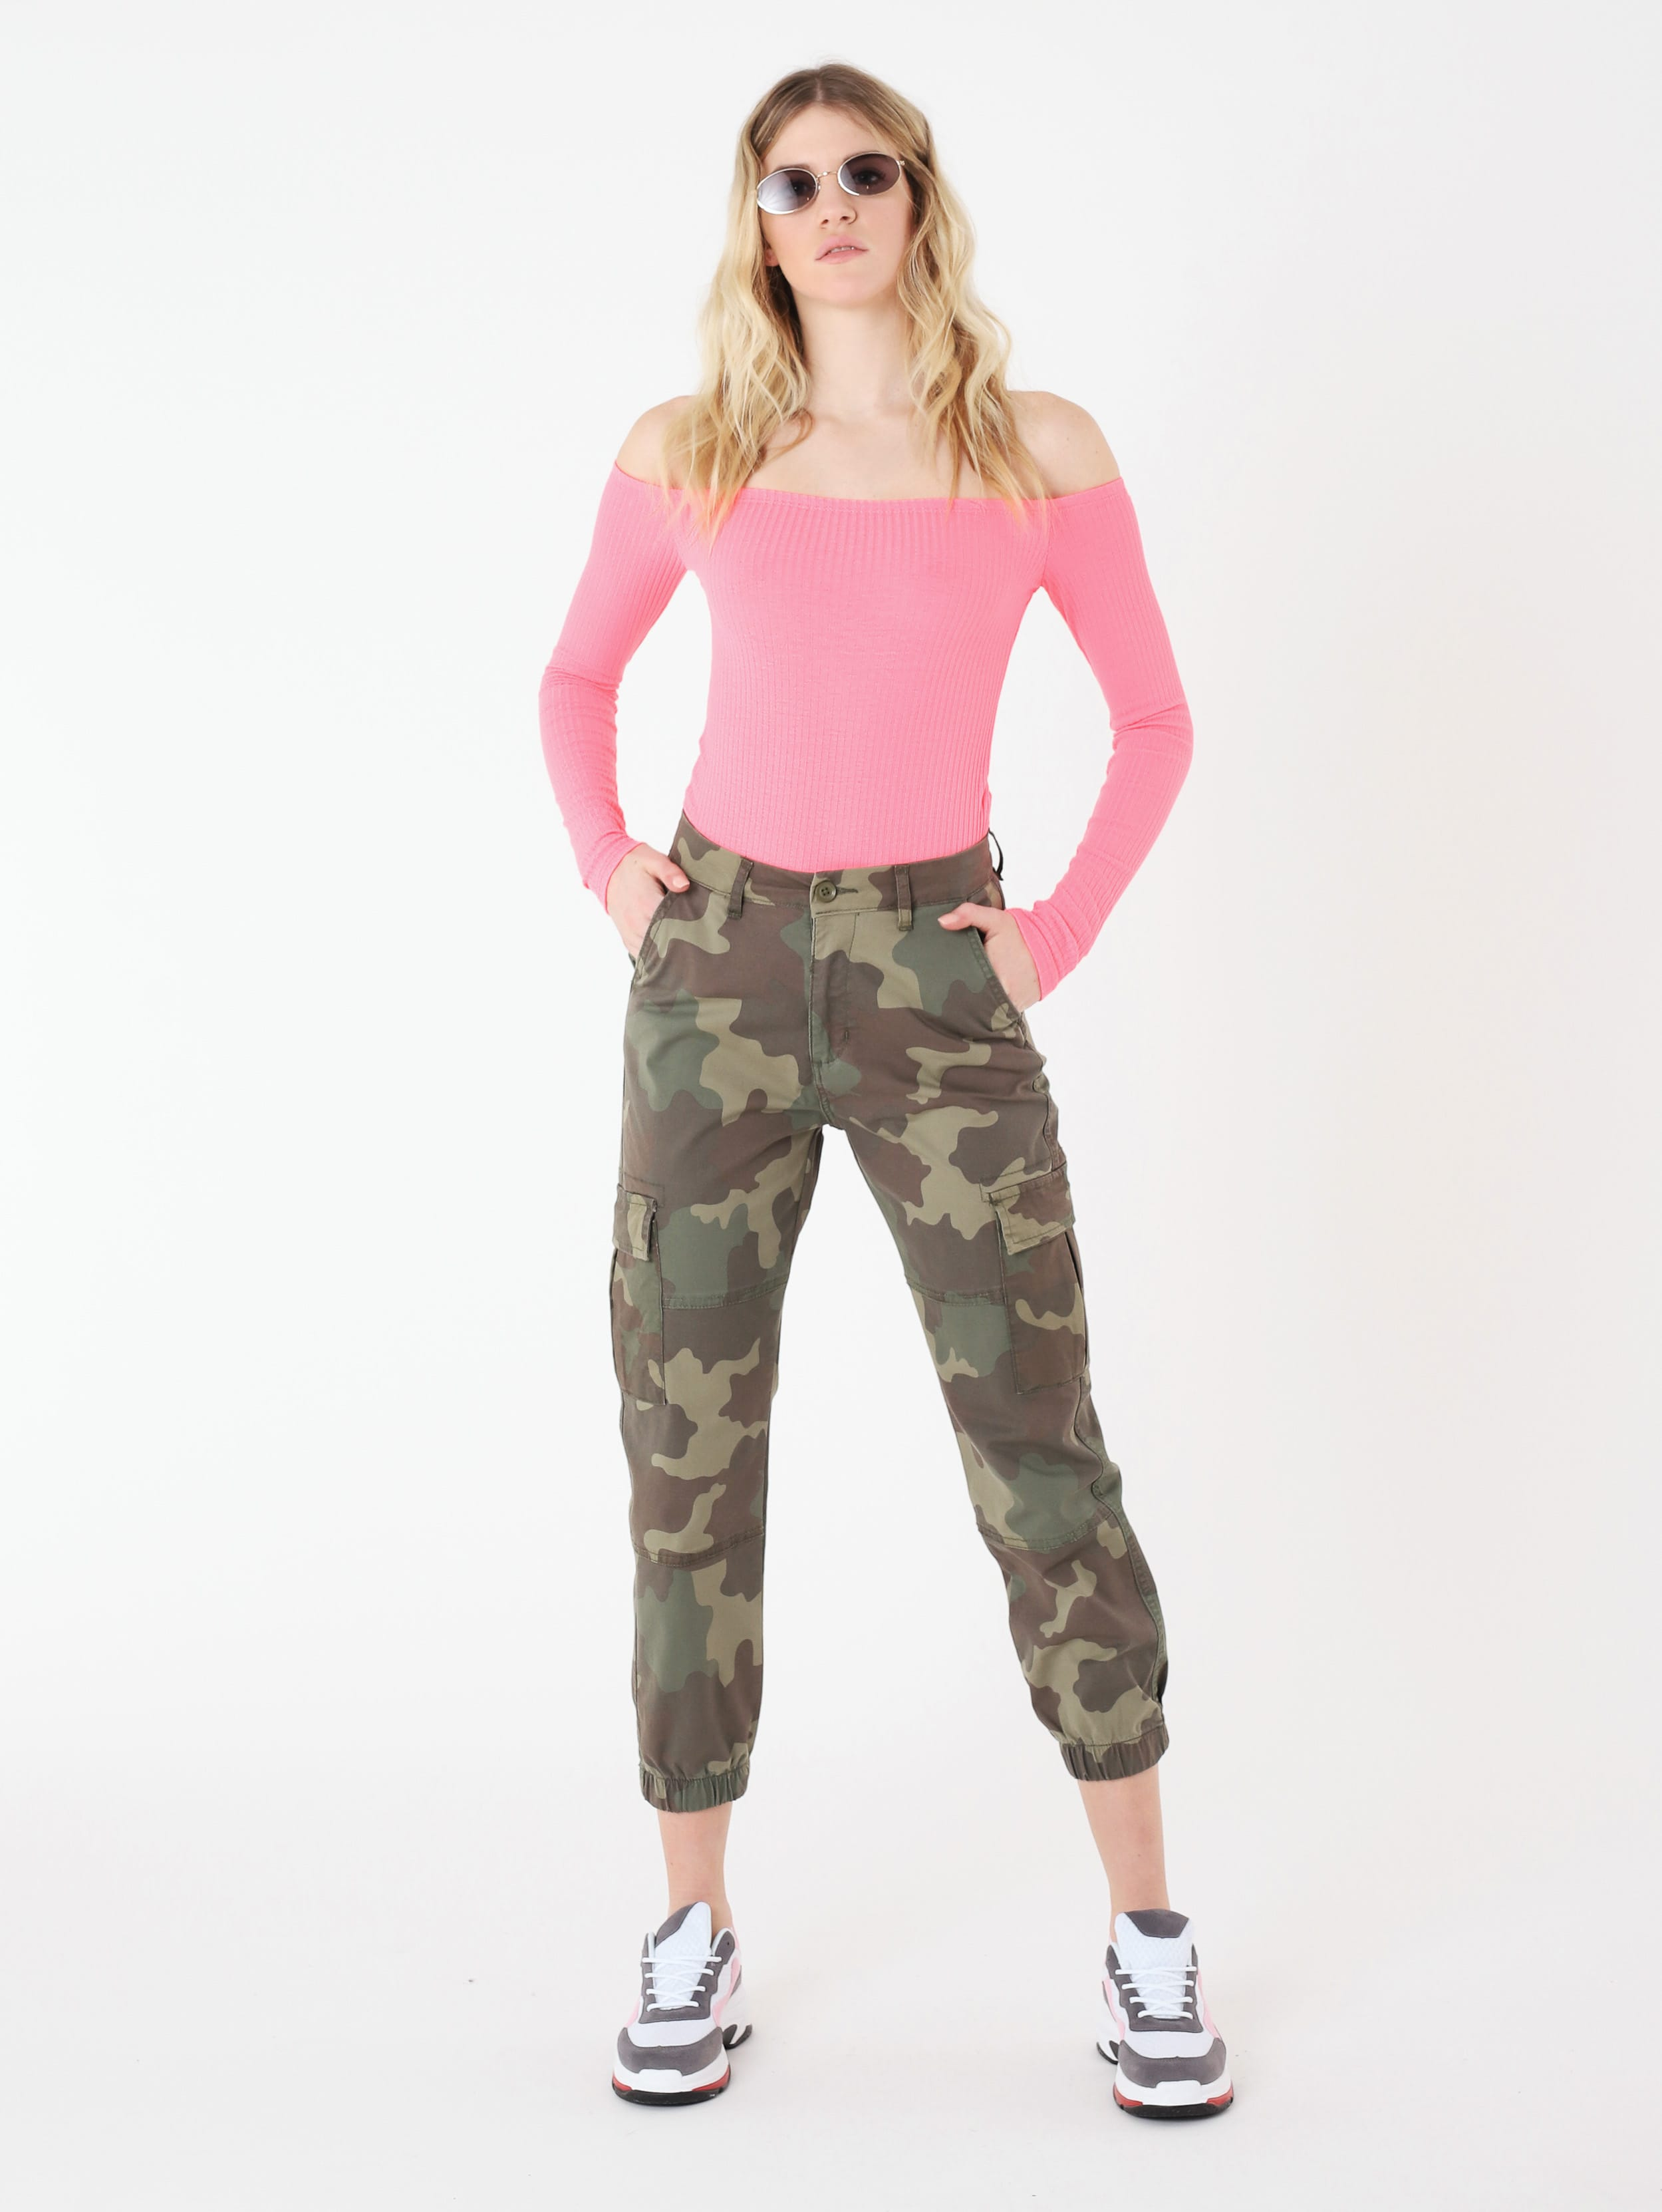 Pantaloni cargo mimetici Terranova a 25,99 euro